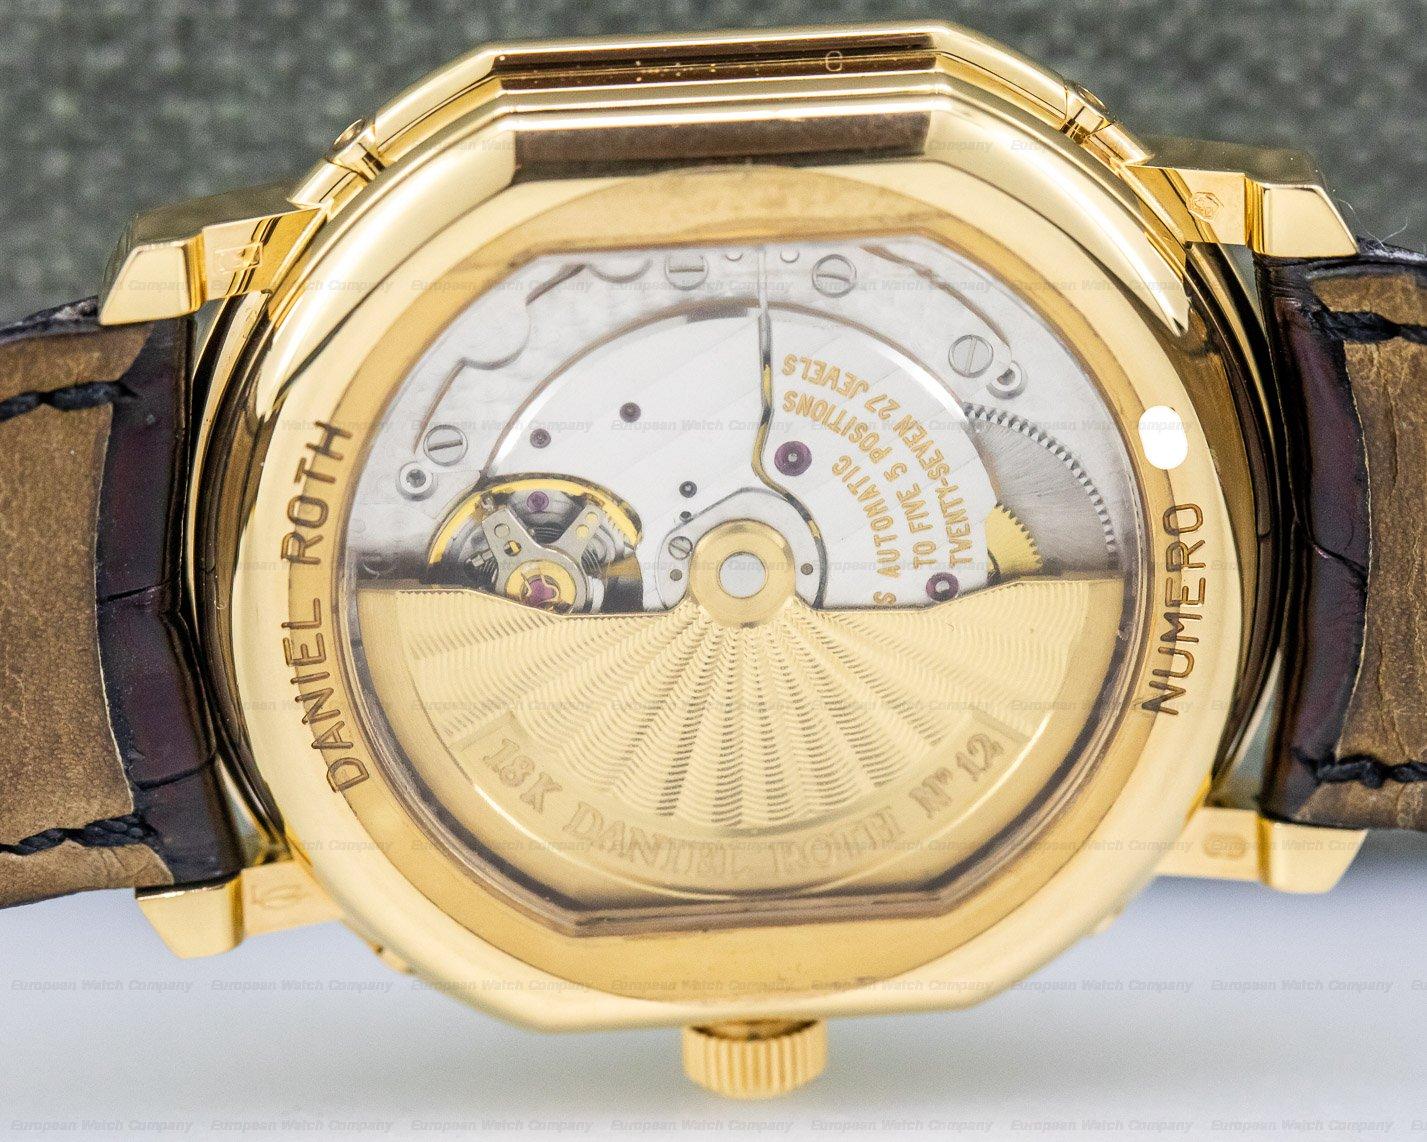 Daniel Roth 118.L.40.011.CN.BA Perpetual Moon phase 18k Yellow Gold